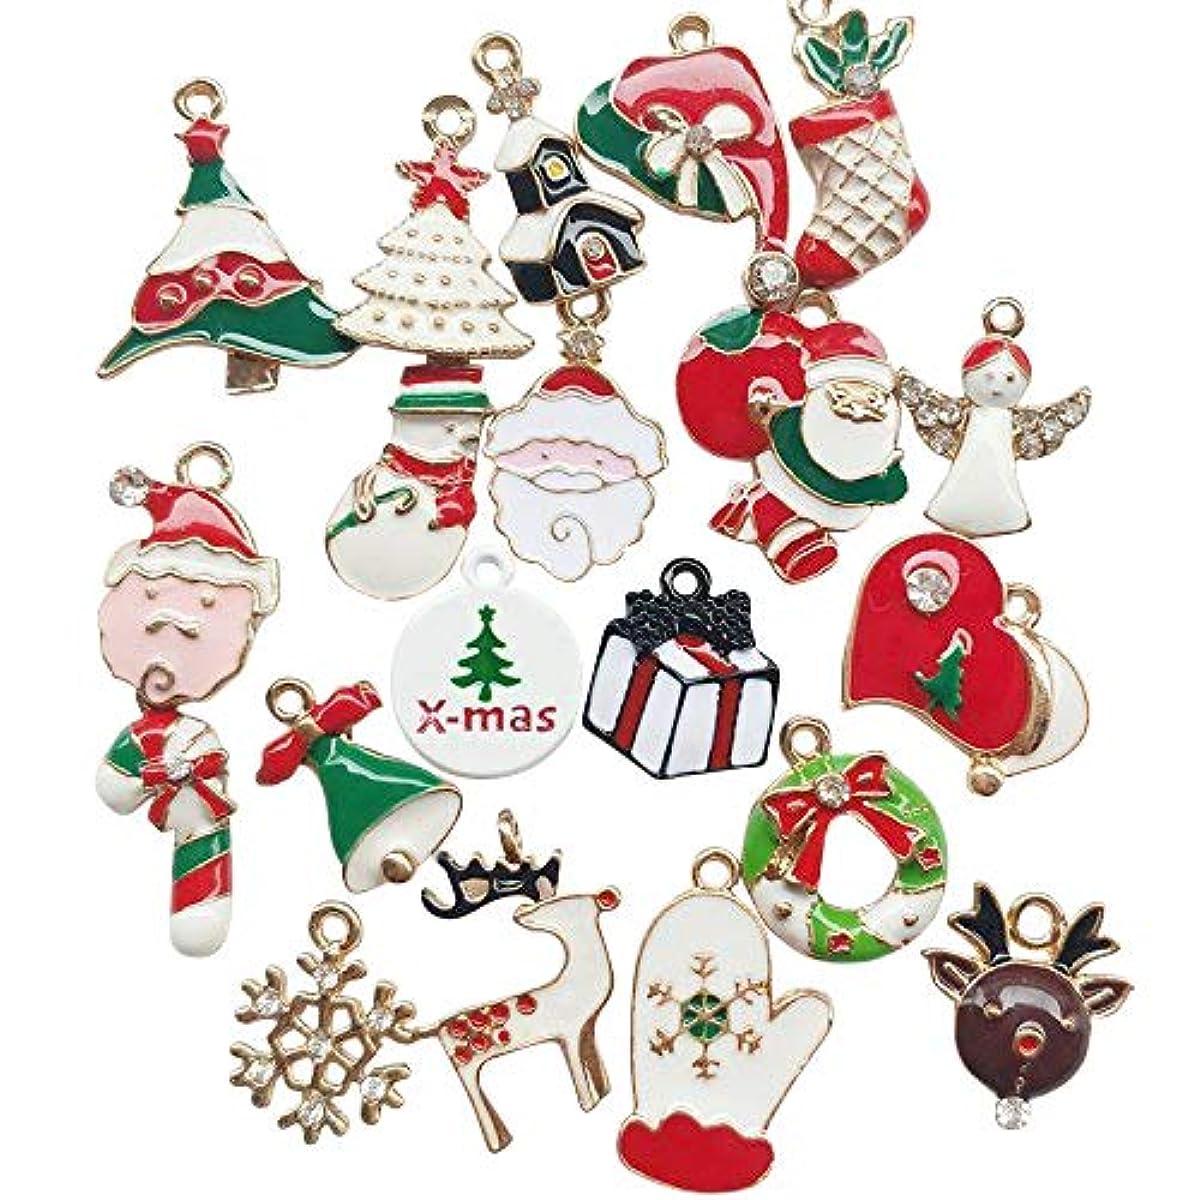 Chenkou Craft 20pcs Wholesale Lots Mix Alloy Christmas Pendants Charms Bracelet Necklace Jewelry Findings Christmas Tree Bear Sock Jingle Bell Snowman Snowflake Claus Gift Box House Garland